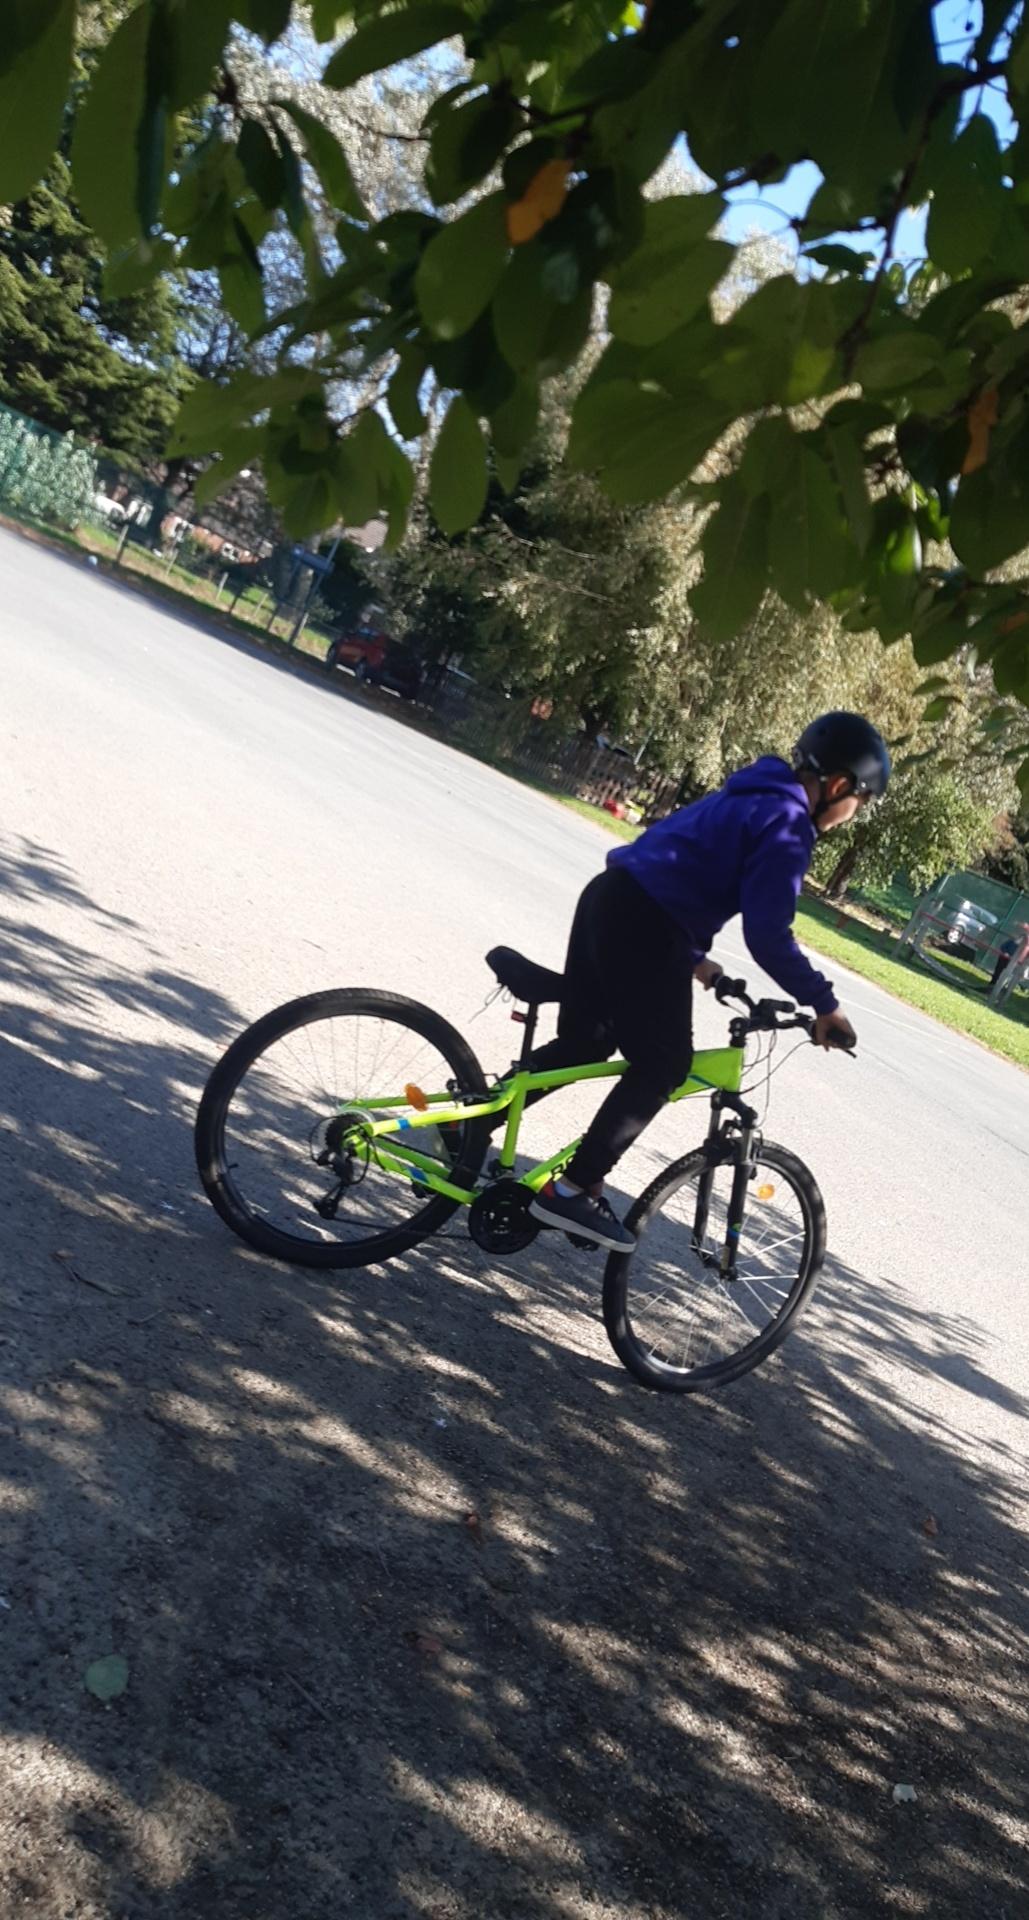 A young boy on a bike